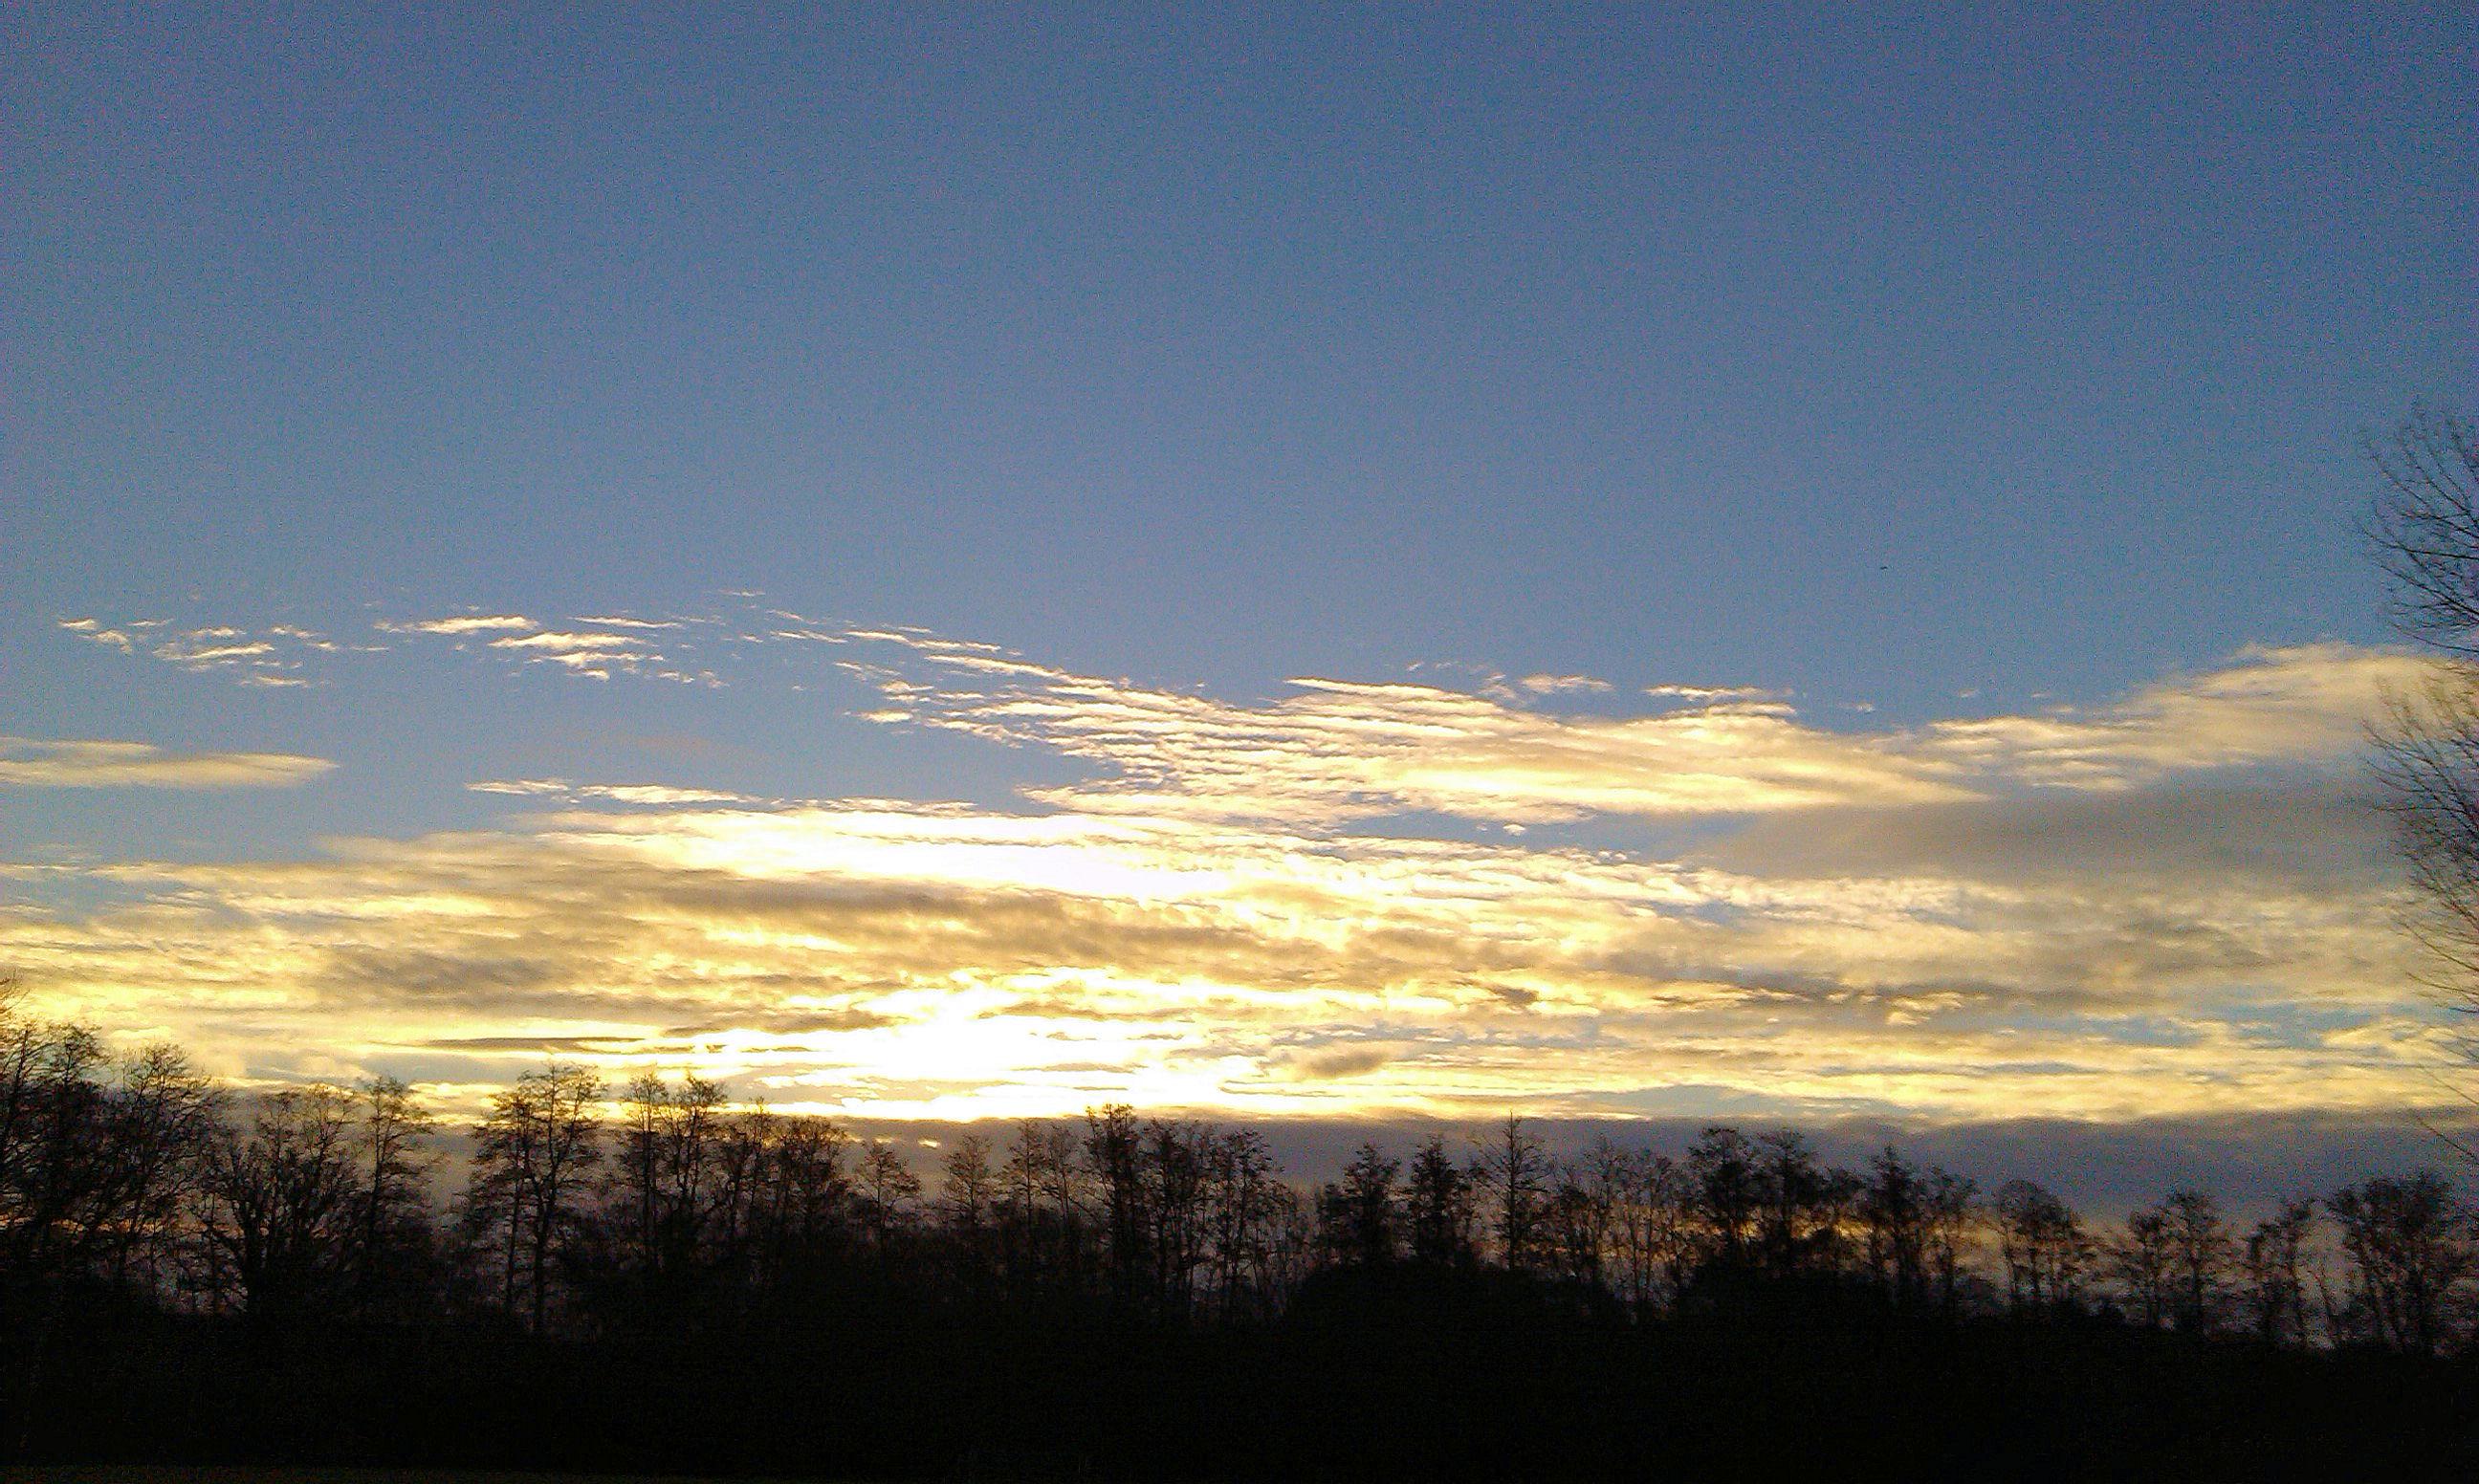 upload_2014-12-19_11-45-54.jpeg